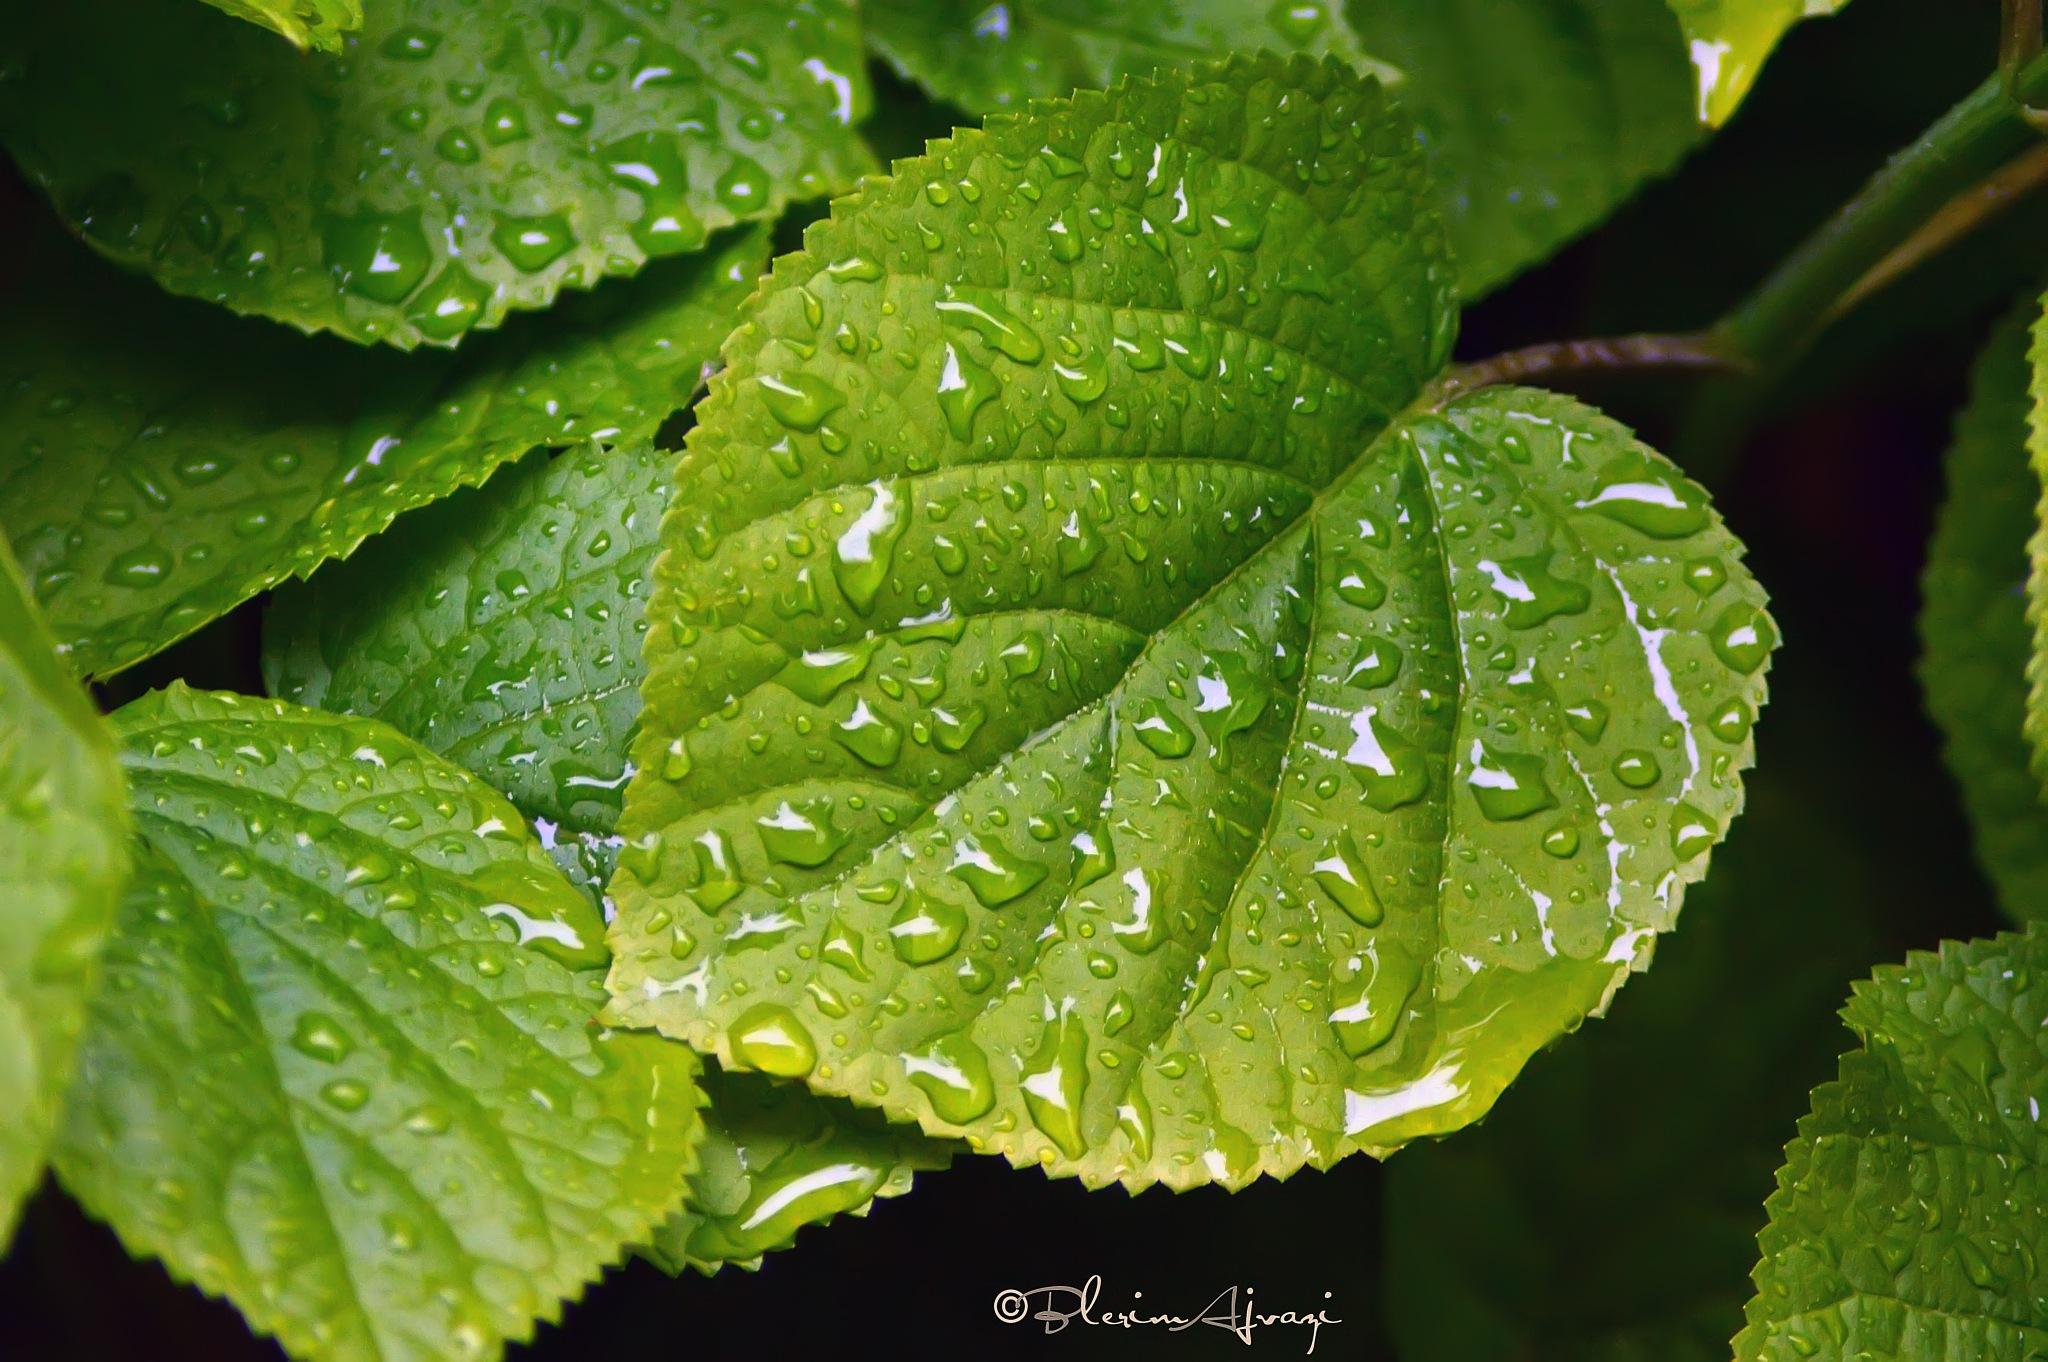 Rainy leaf by Blerim Ajvazi